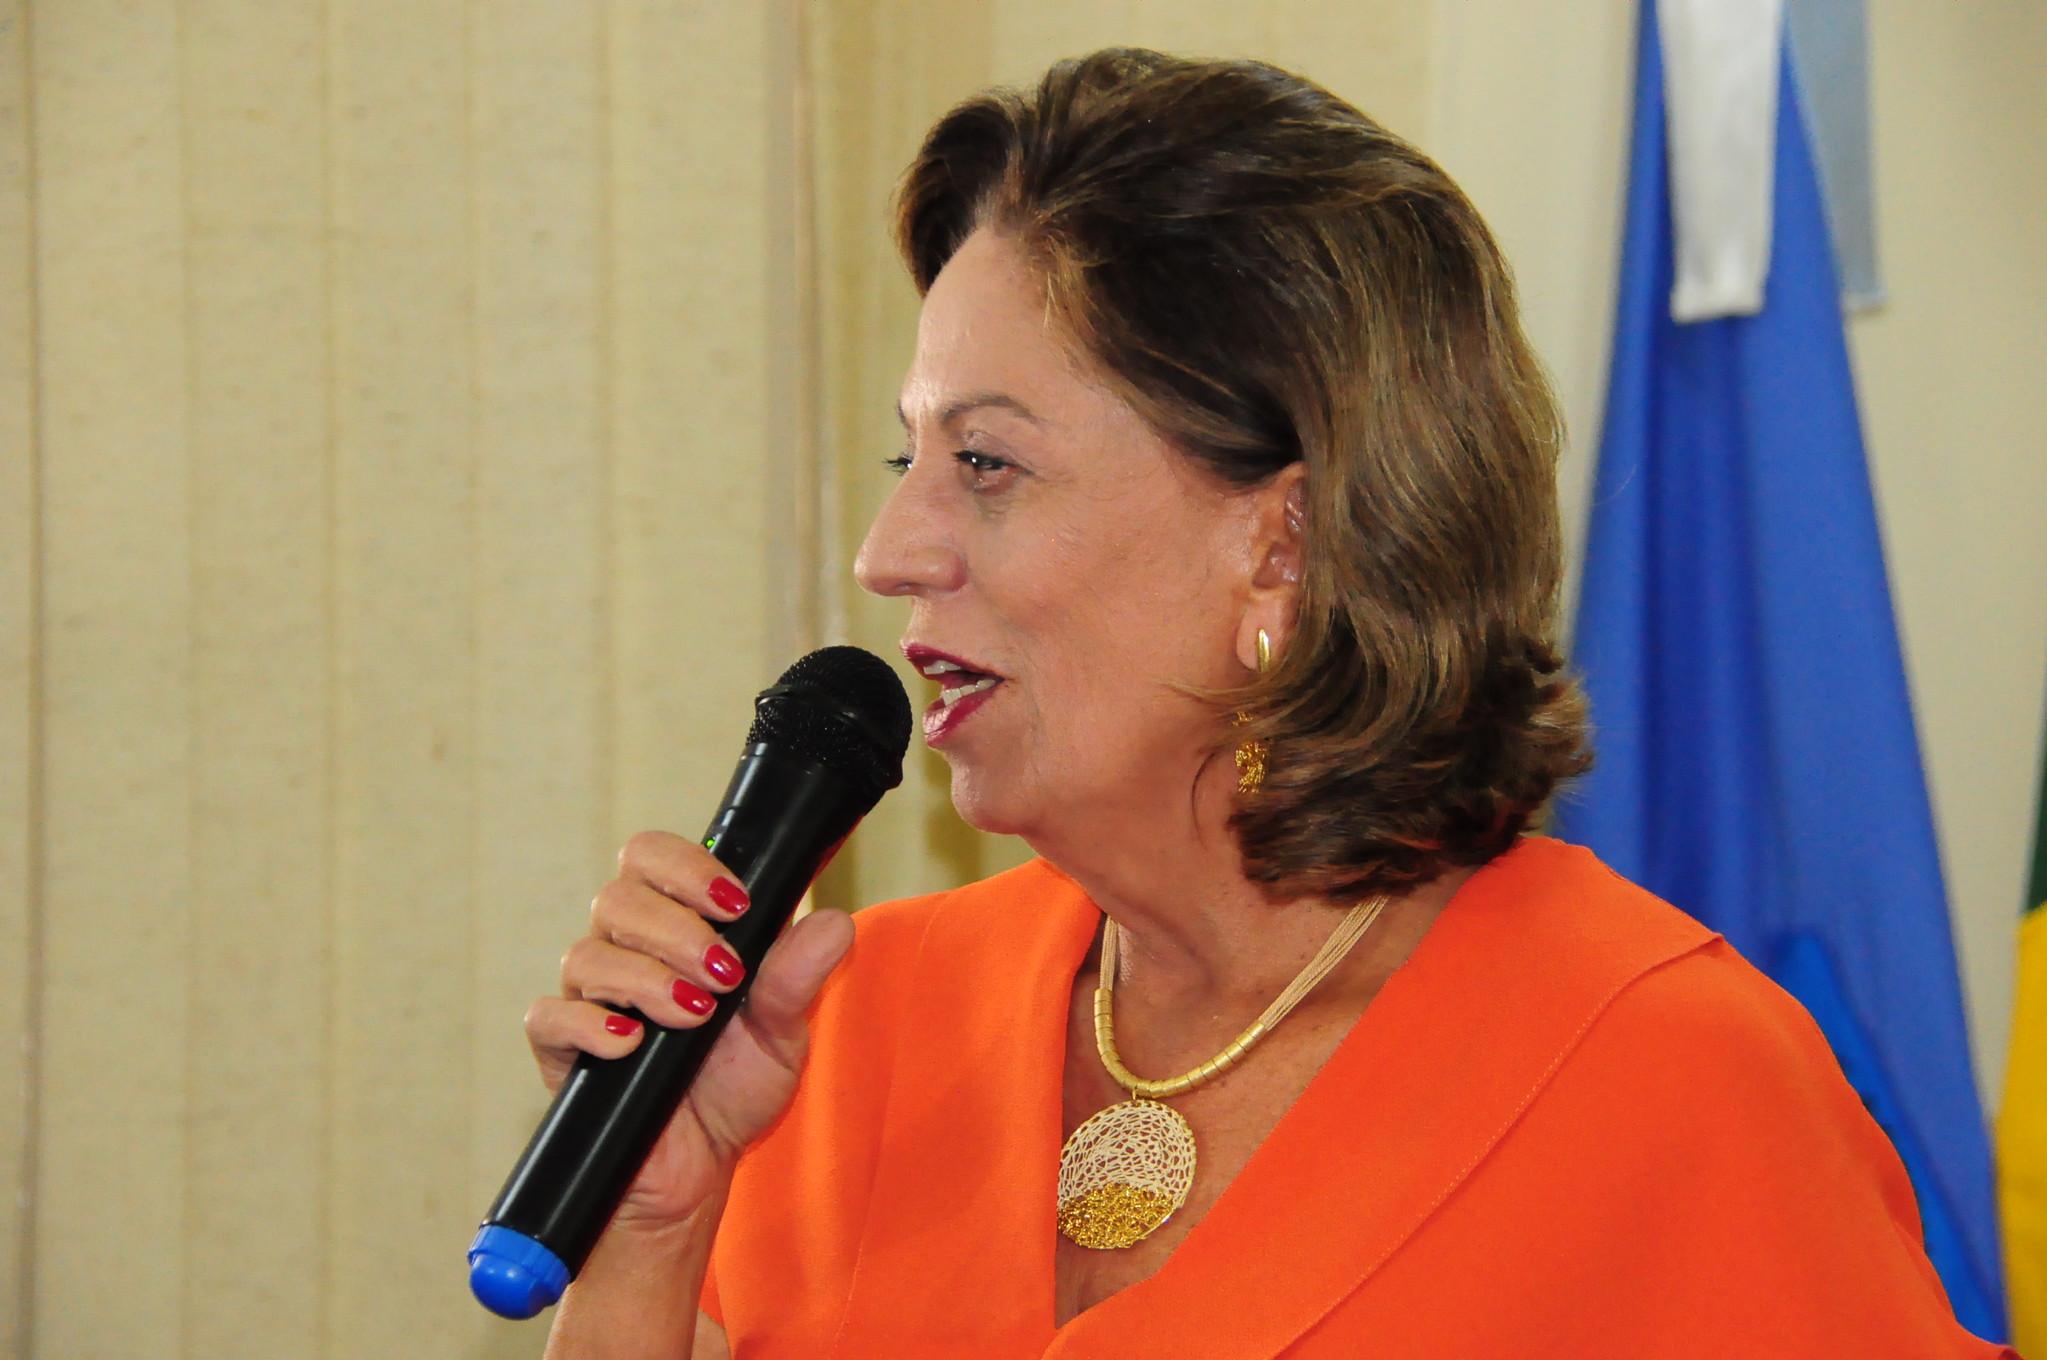 Prefeita Rosalba Ciarlini retornará a Brasília para audiência com Ministro da Justiça